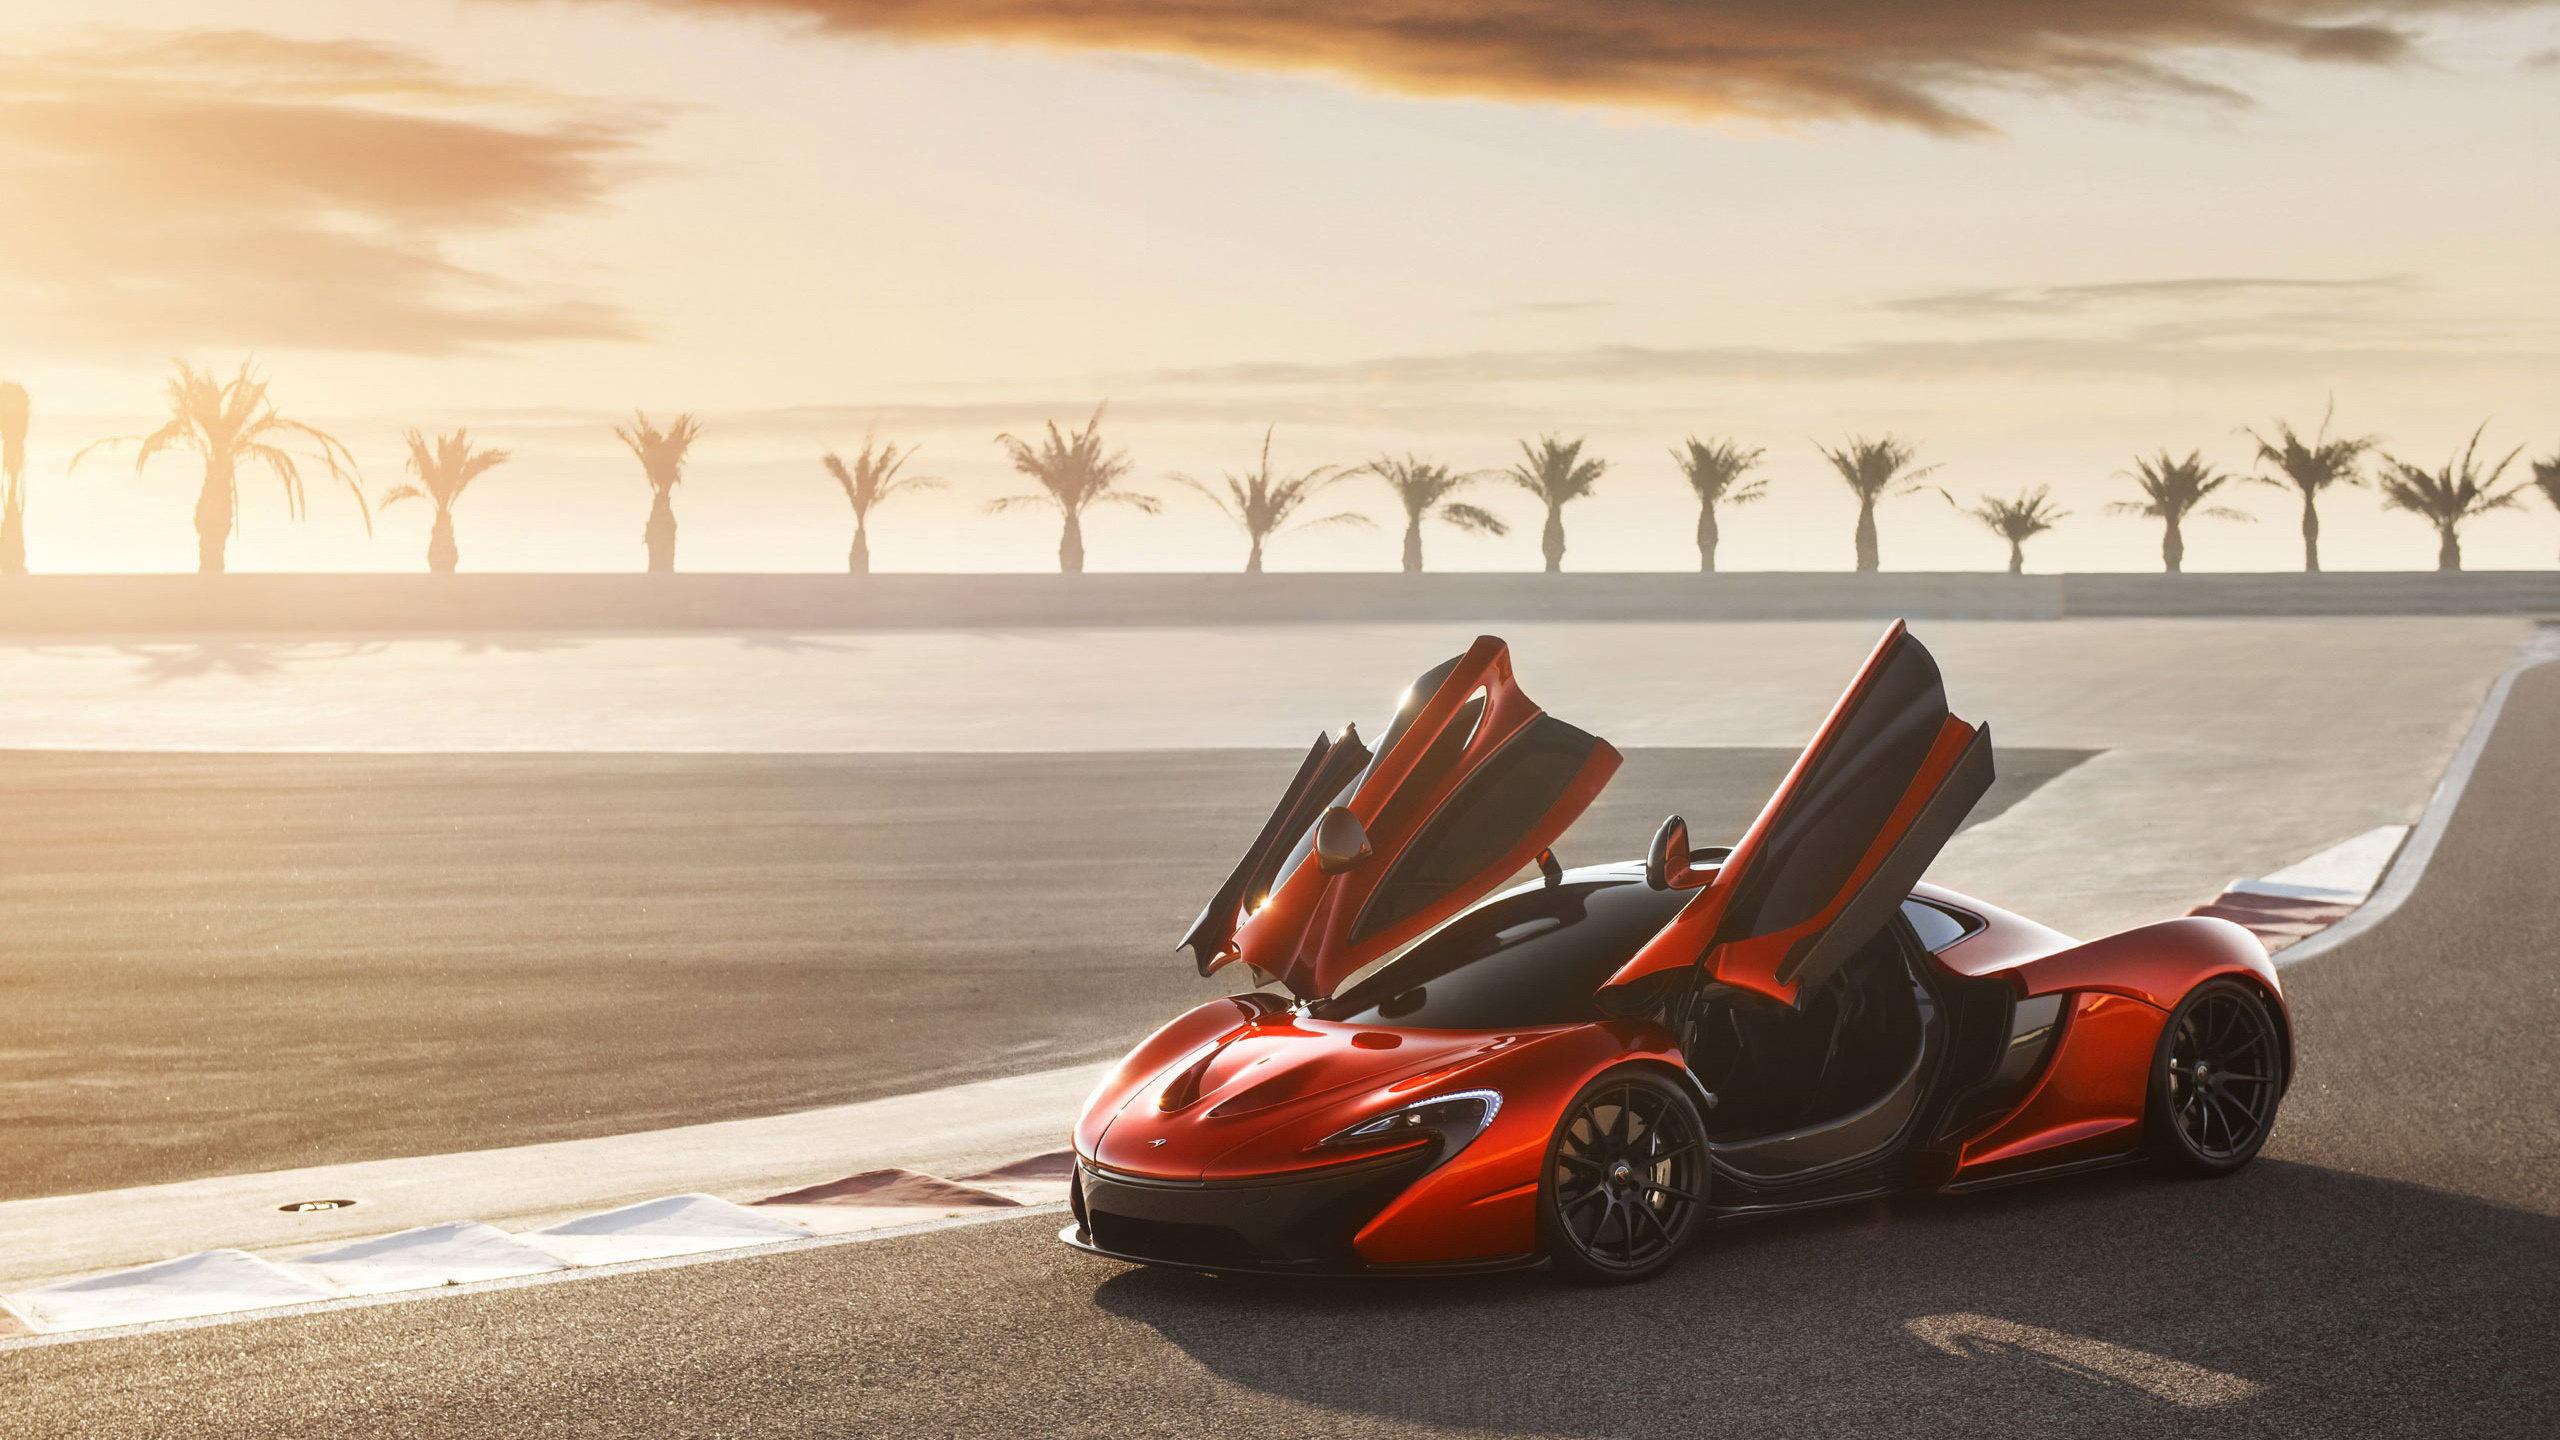 Download 50 Super Sports Car Wallpapers Thatll Blow Your Desktop